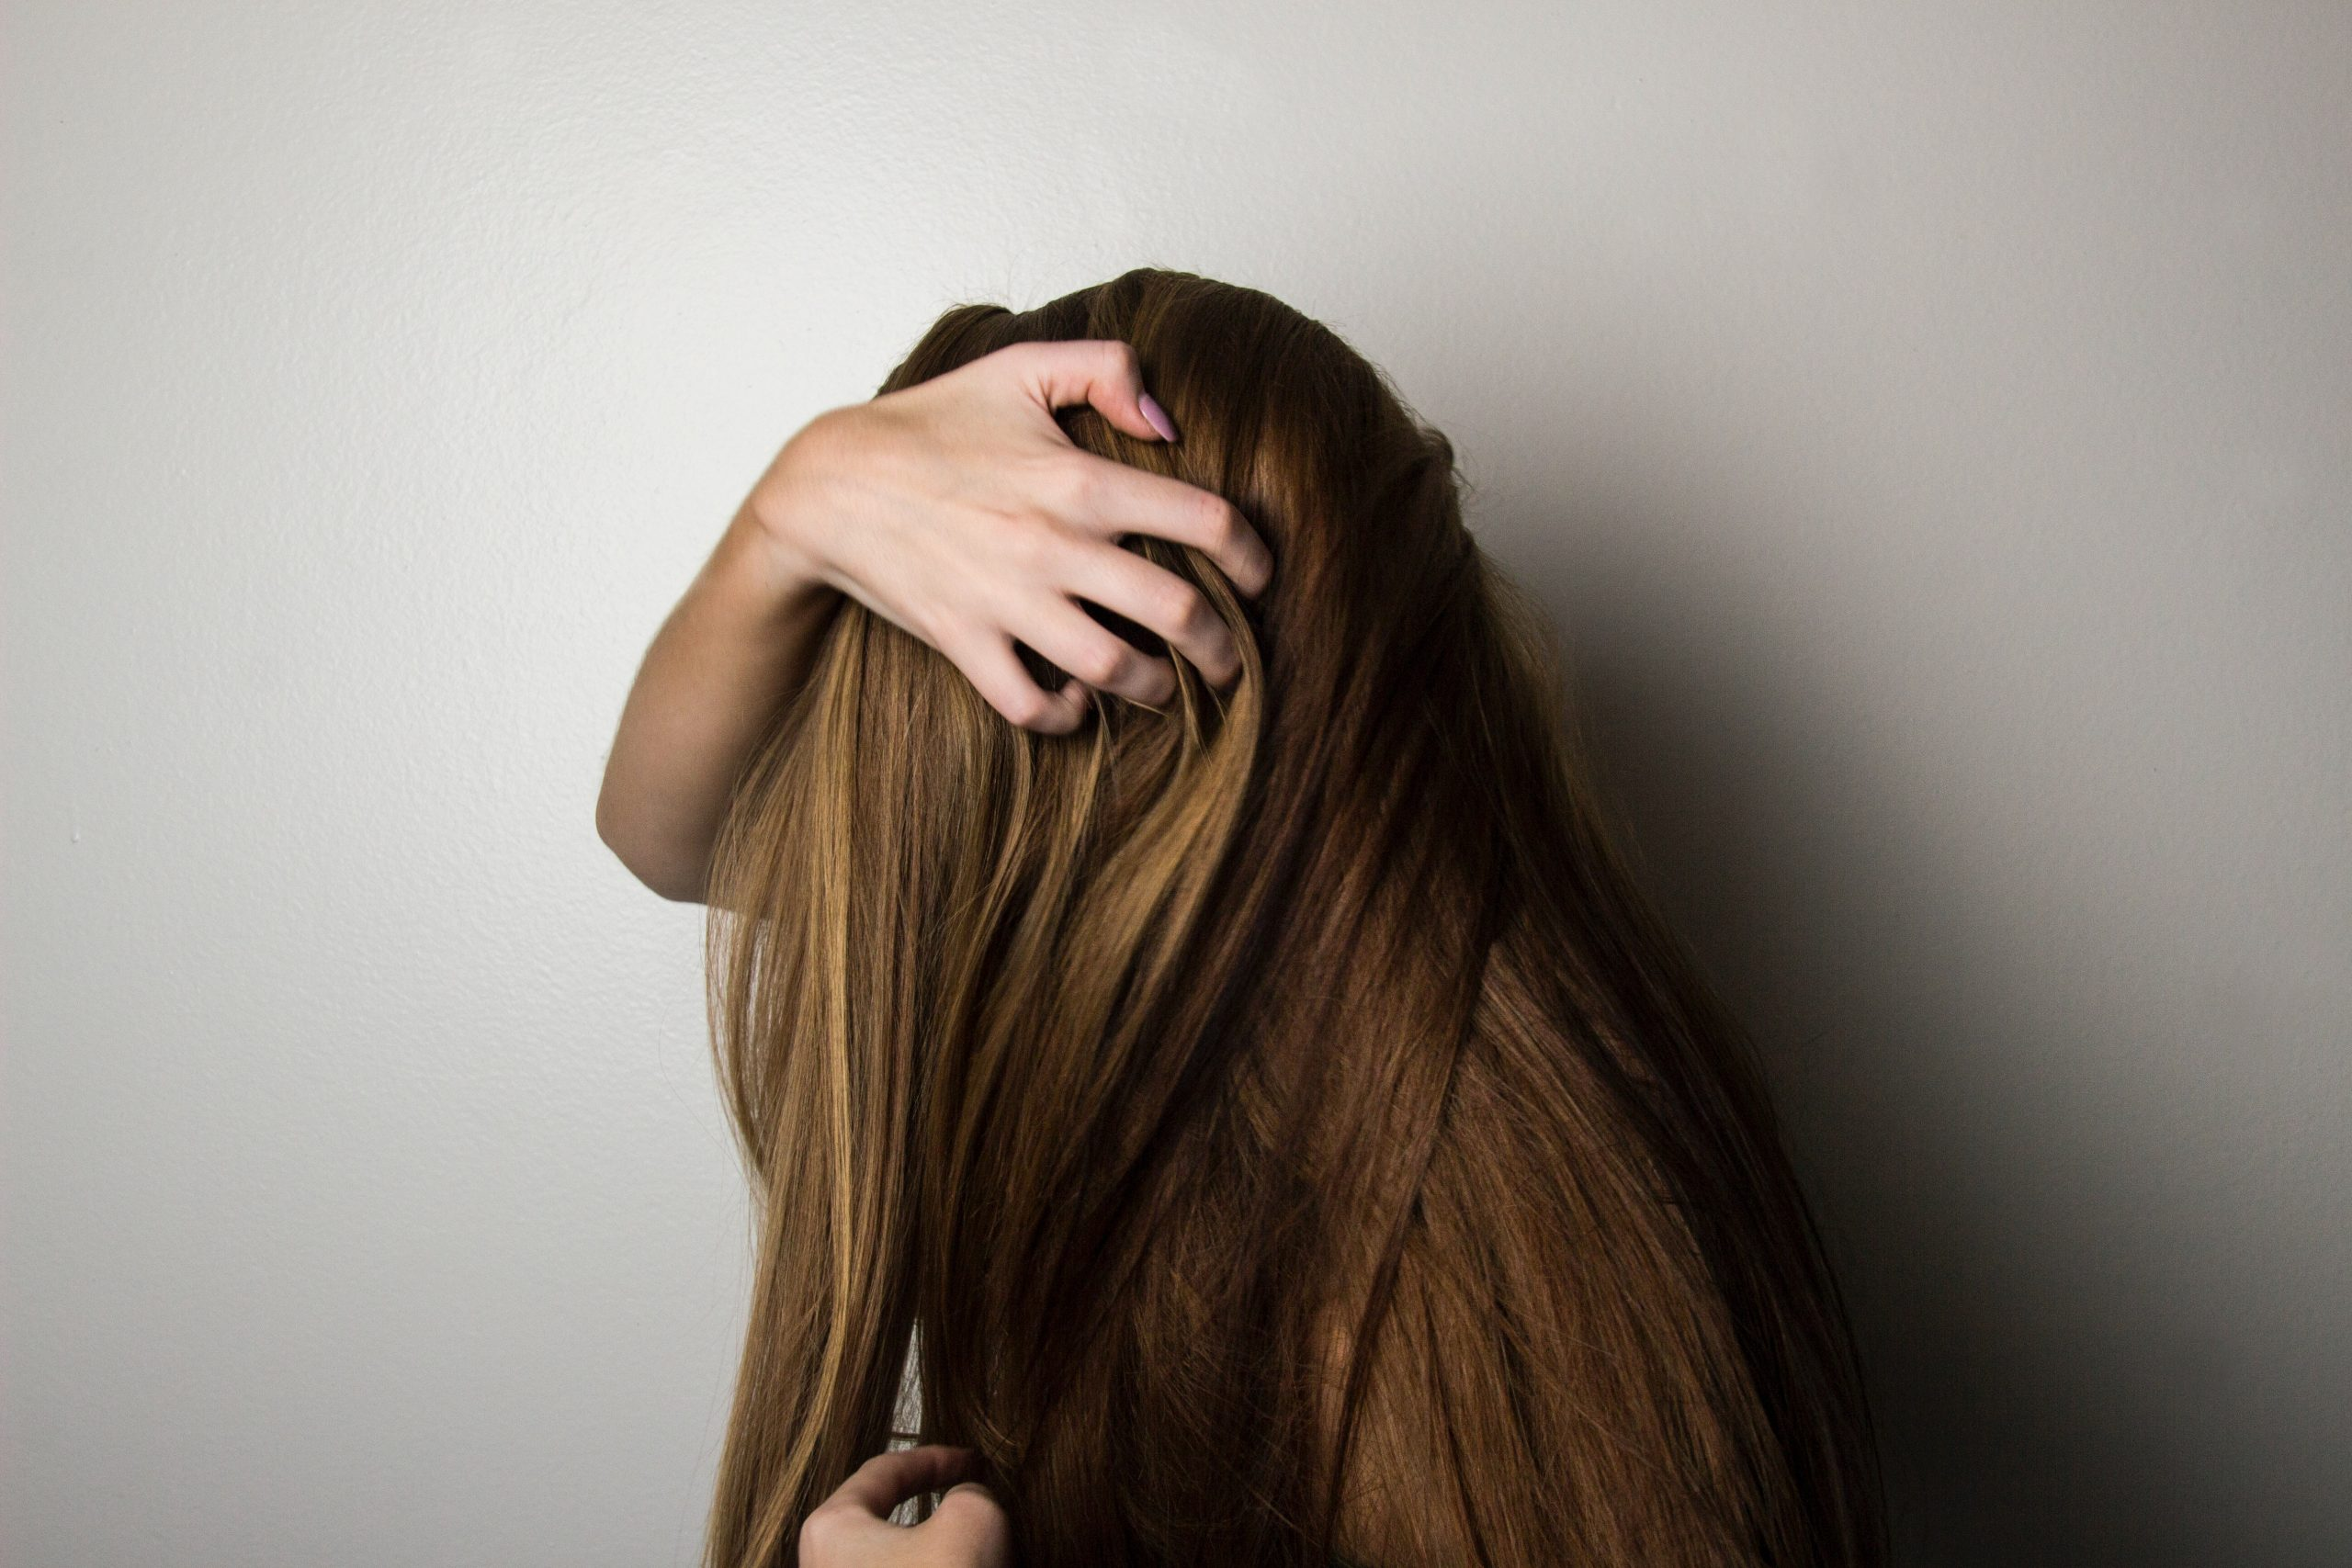 pelo fino y roto